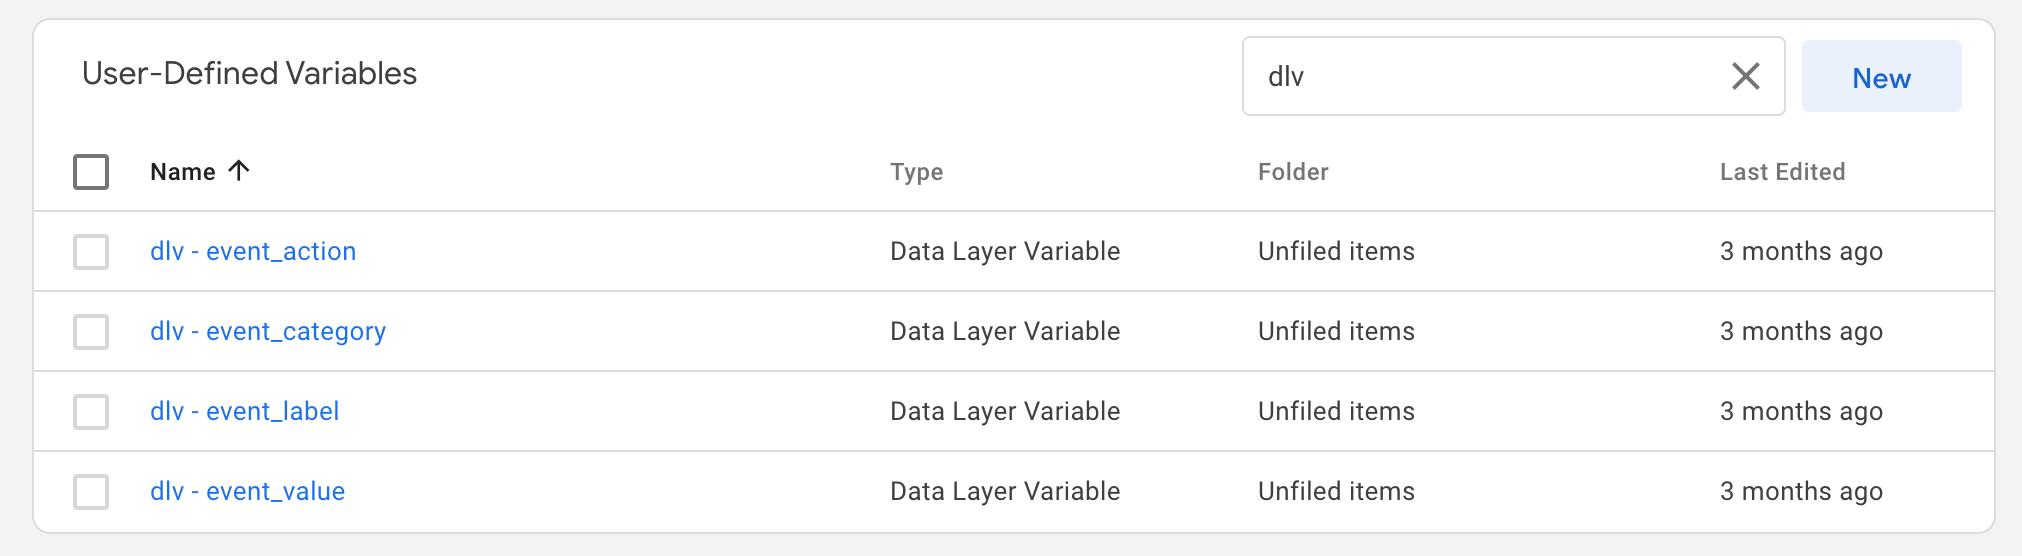 gtm_variable_01_en web vitals measure web vitals measure field data Google Tag Manager field data